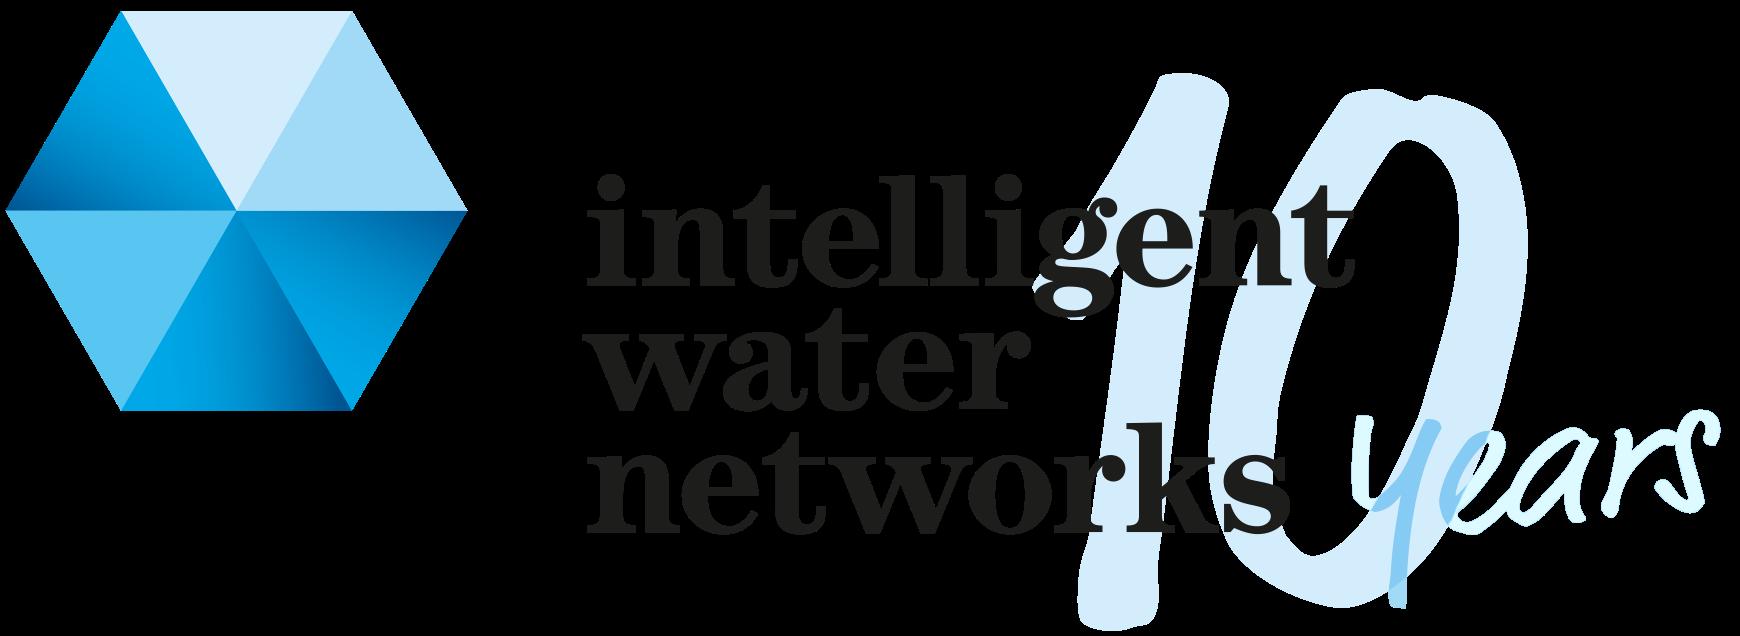 Intelligent Water Networks - Modla Asset Modelling industry built program